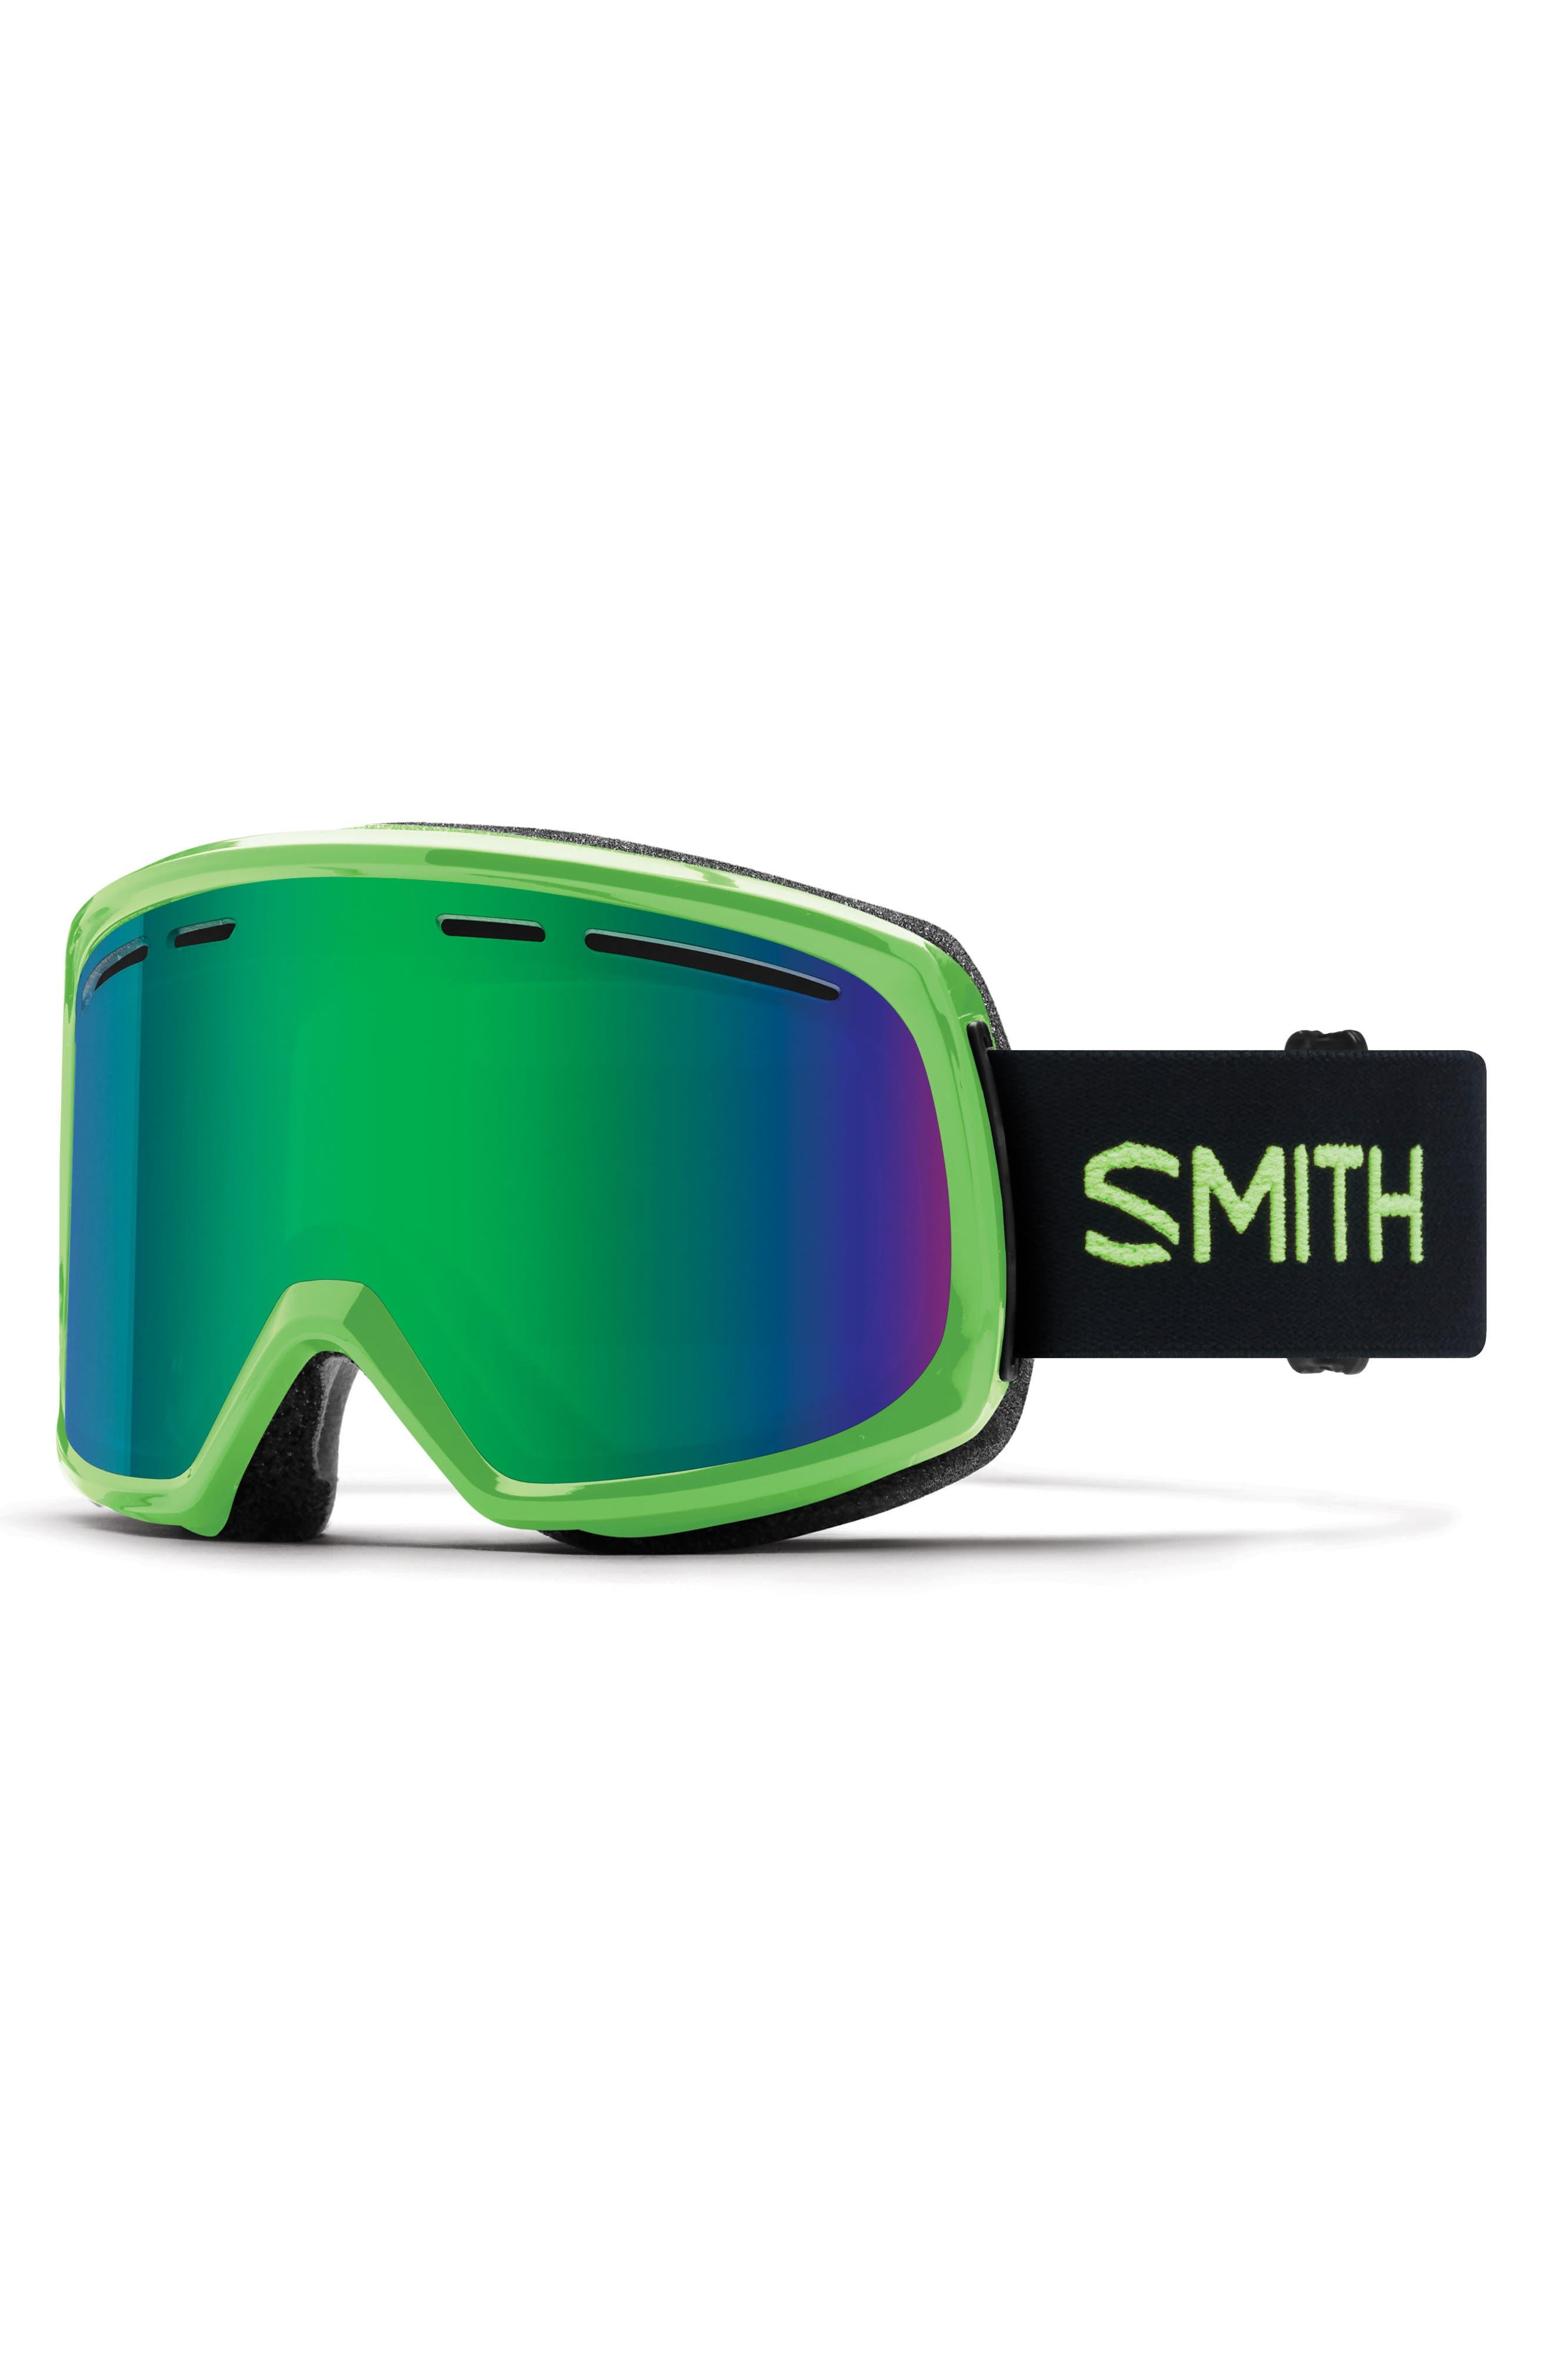 Smith Range Chromapop Snow Goggles